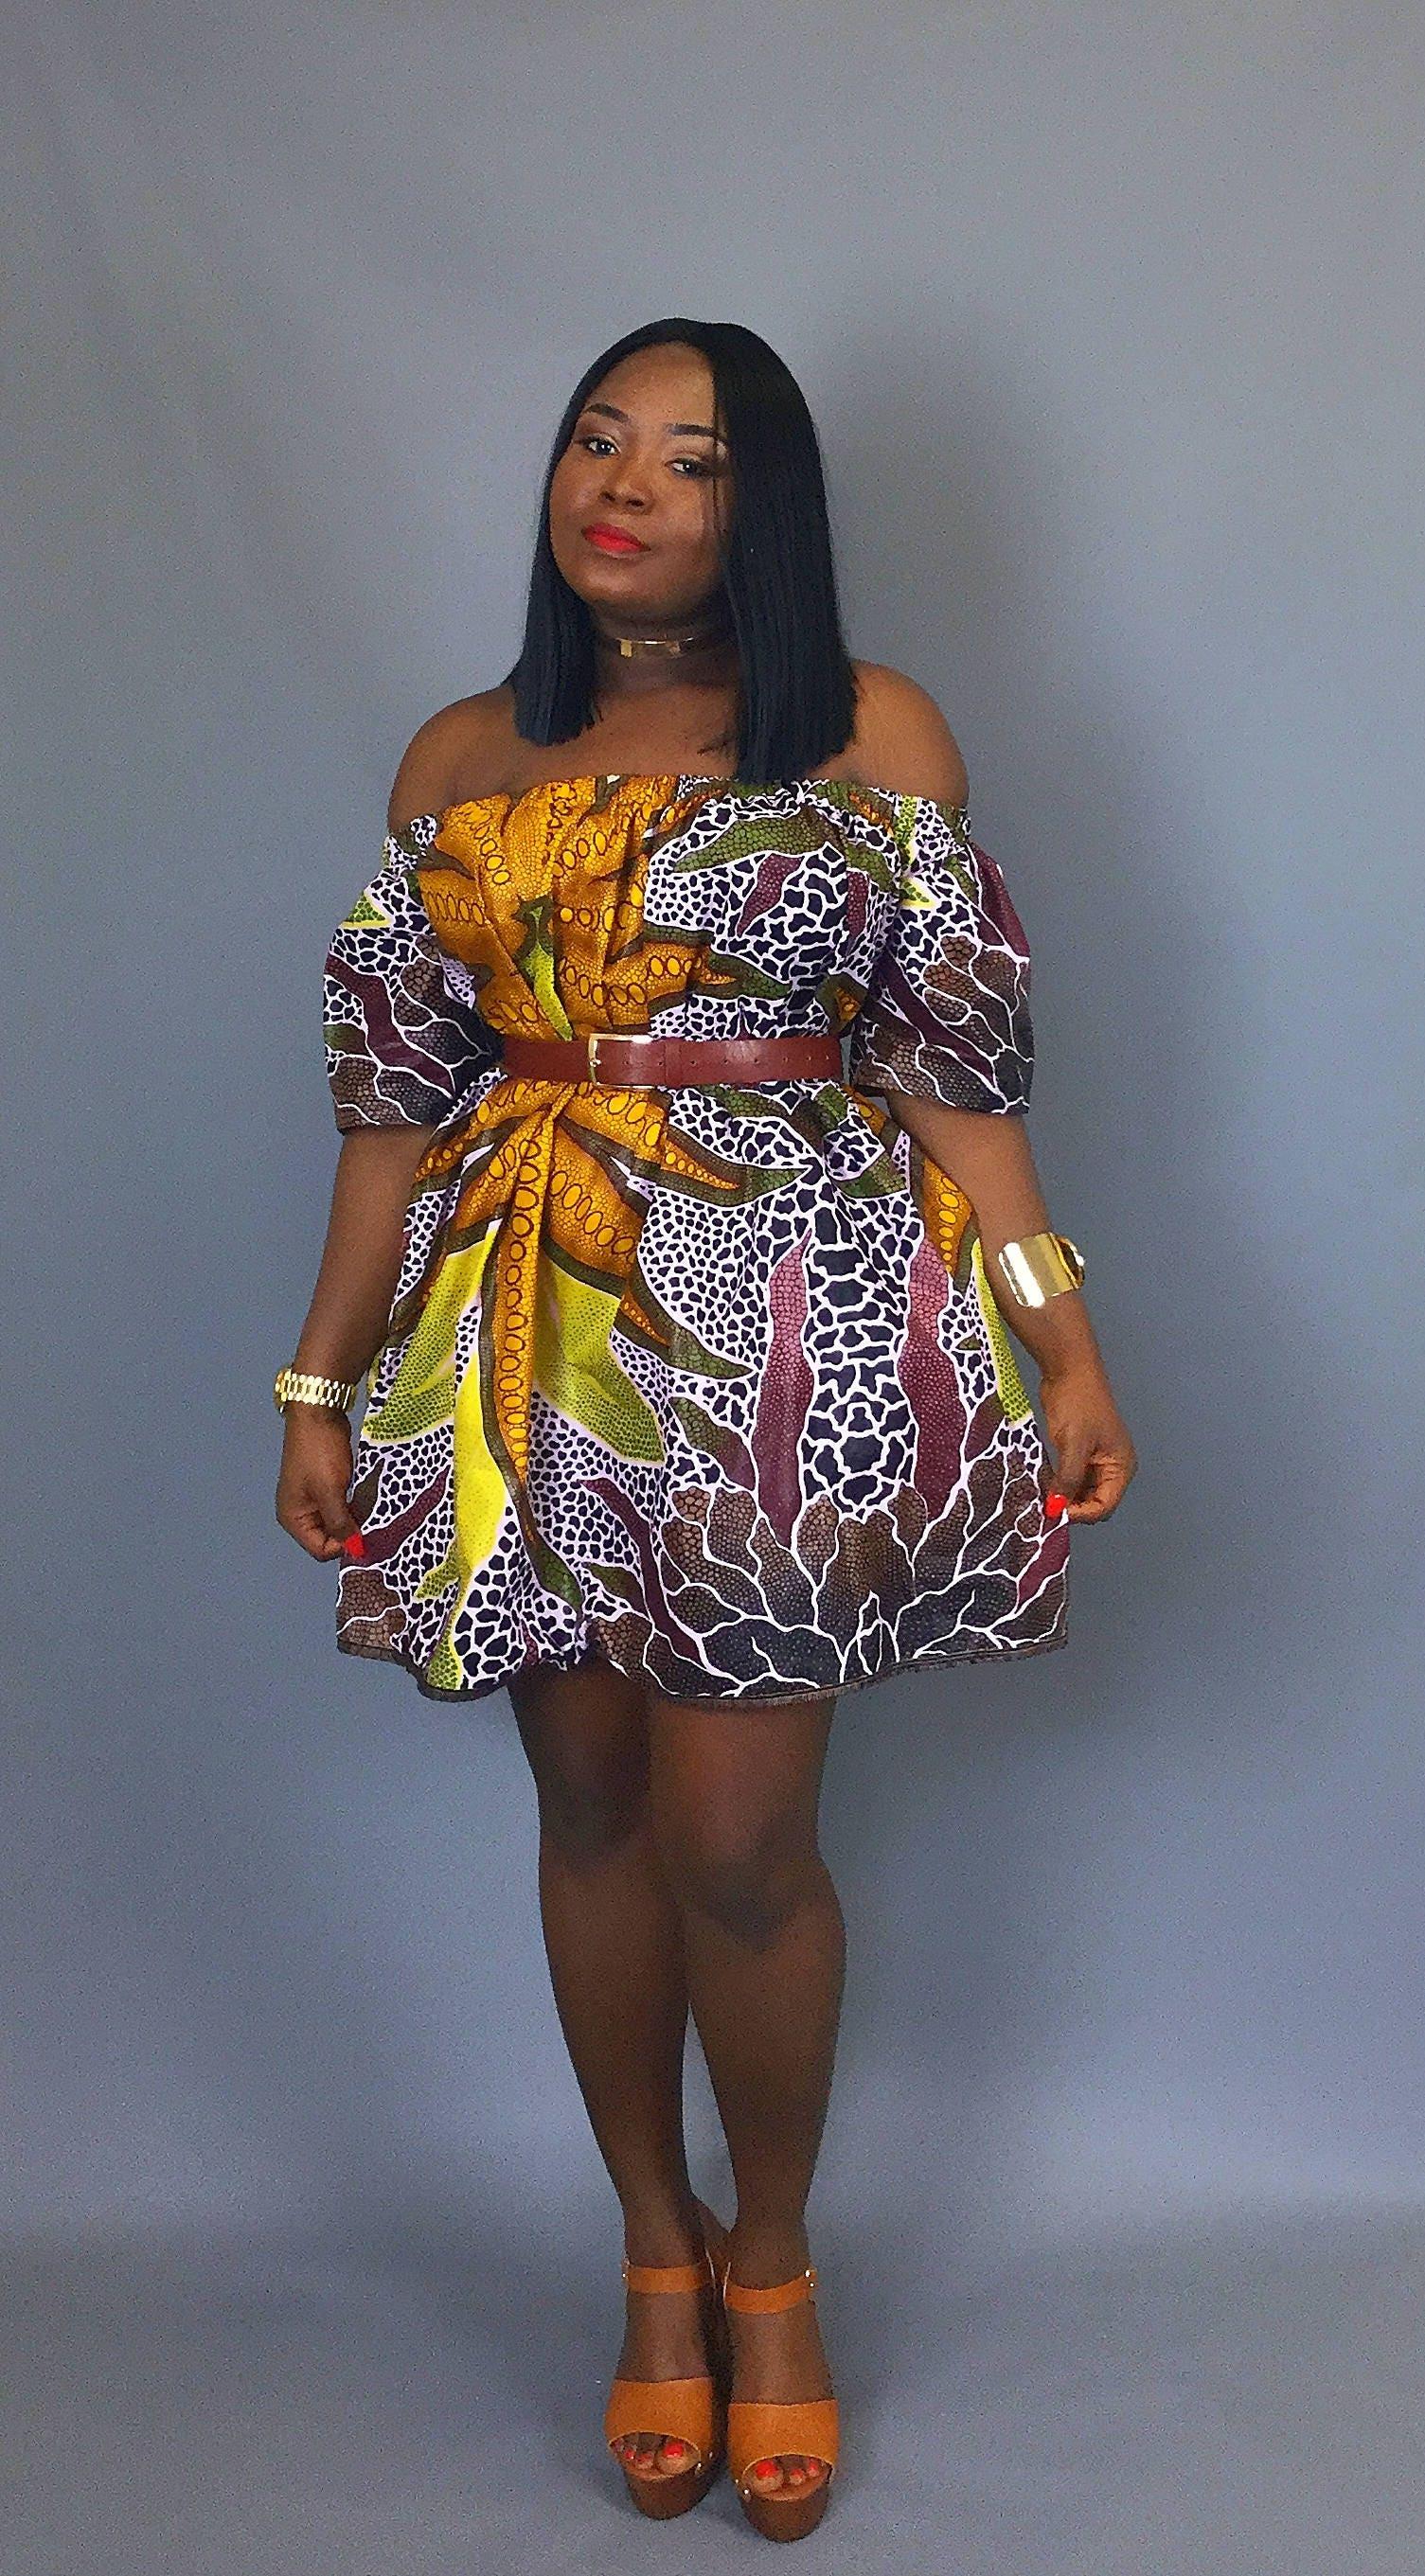 African print off shoulder dressjava print dress dashiki dressAfrican clothingwax print dressmini dresssummer dressAfrican fabric